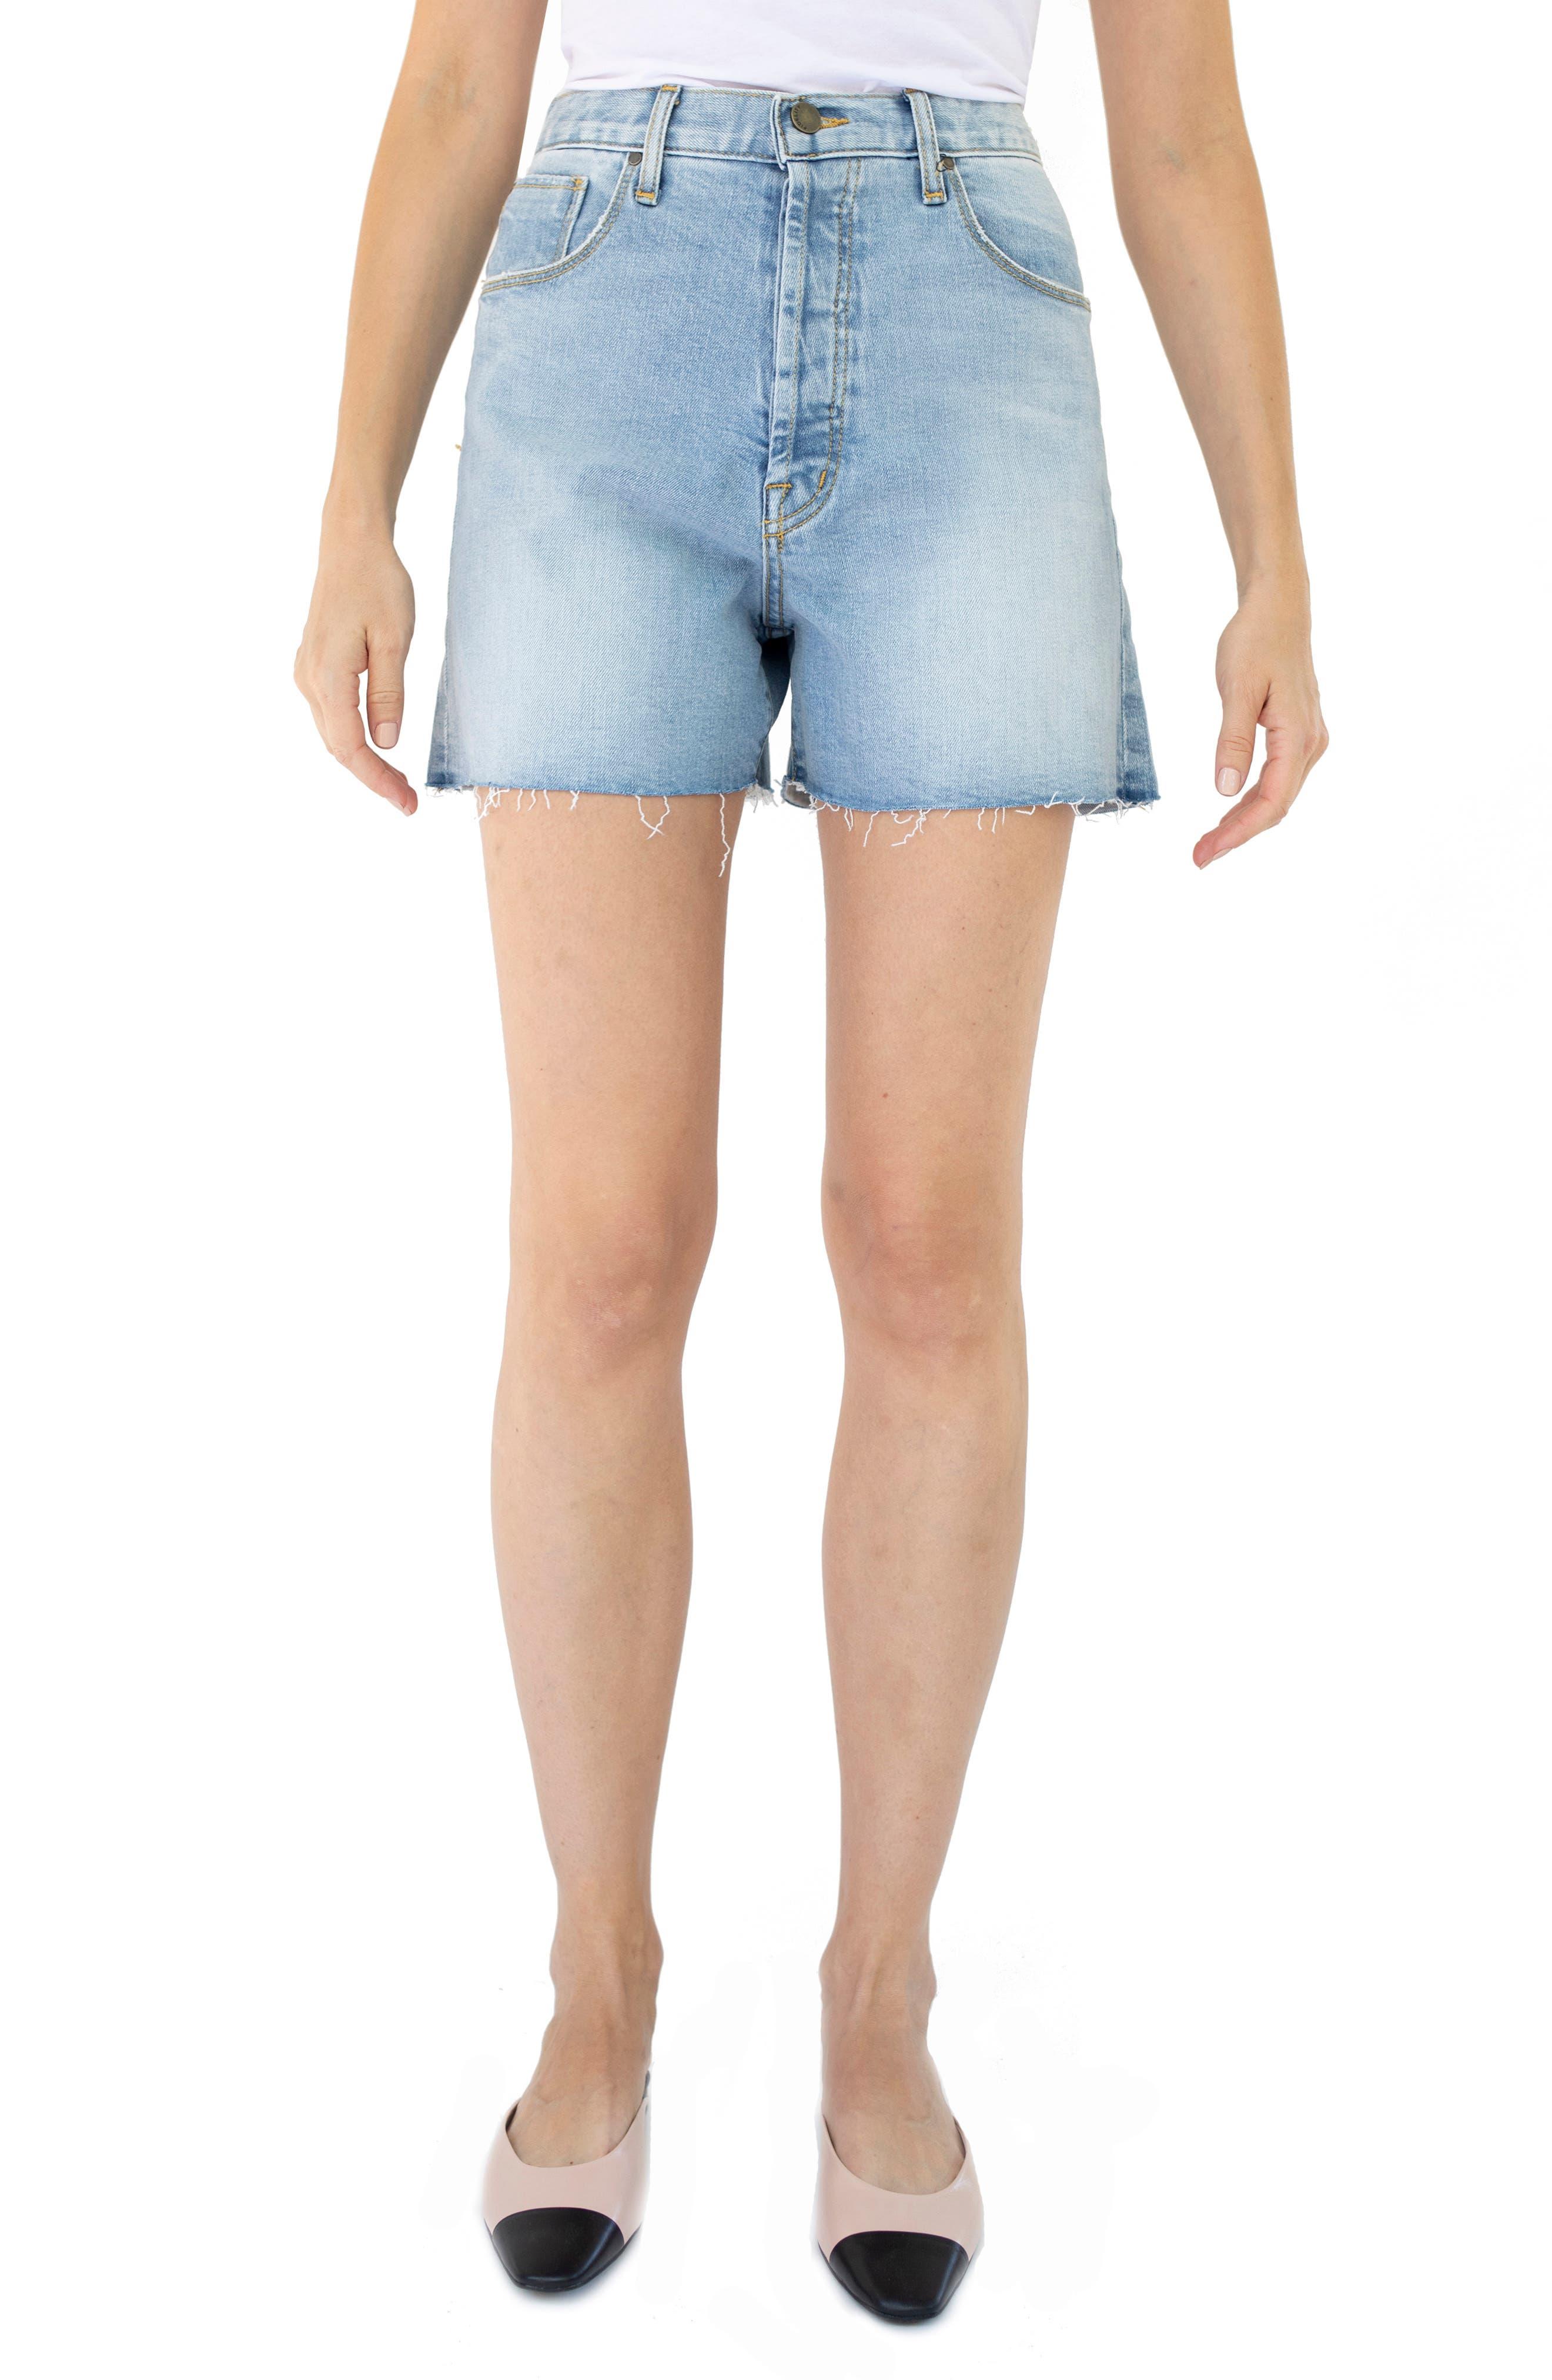 Harley High Waist Cutoff Denim Shorts